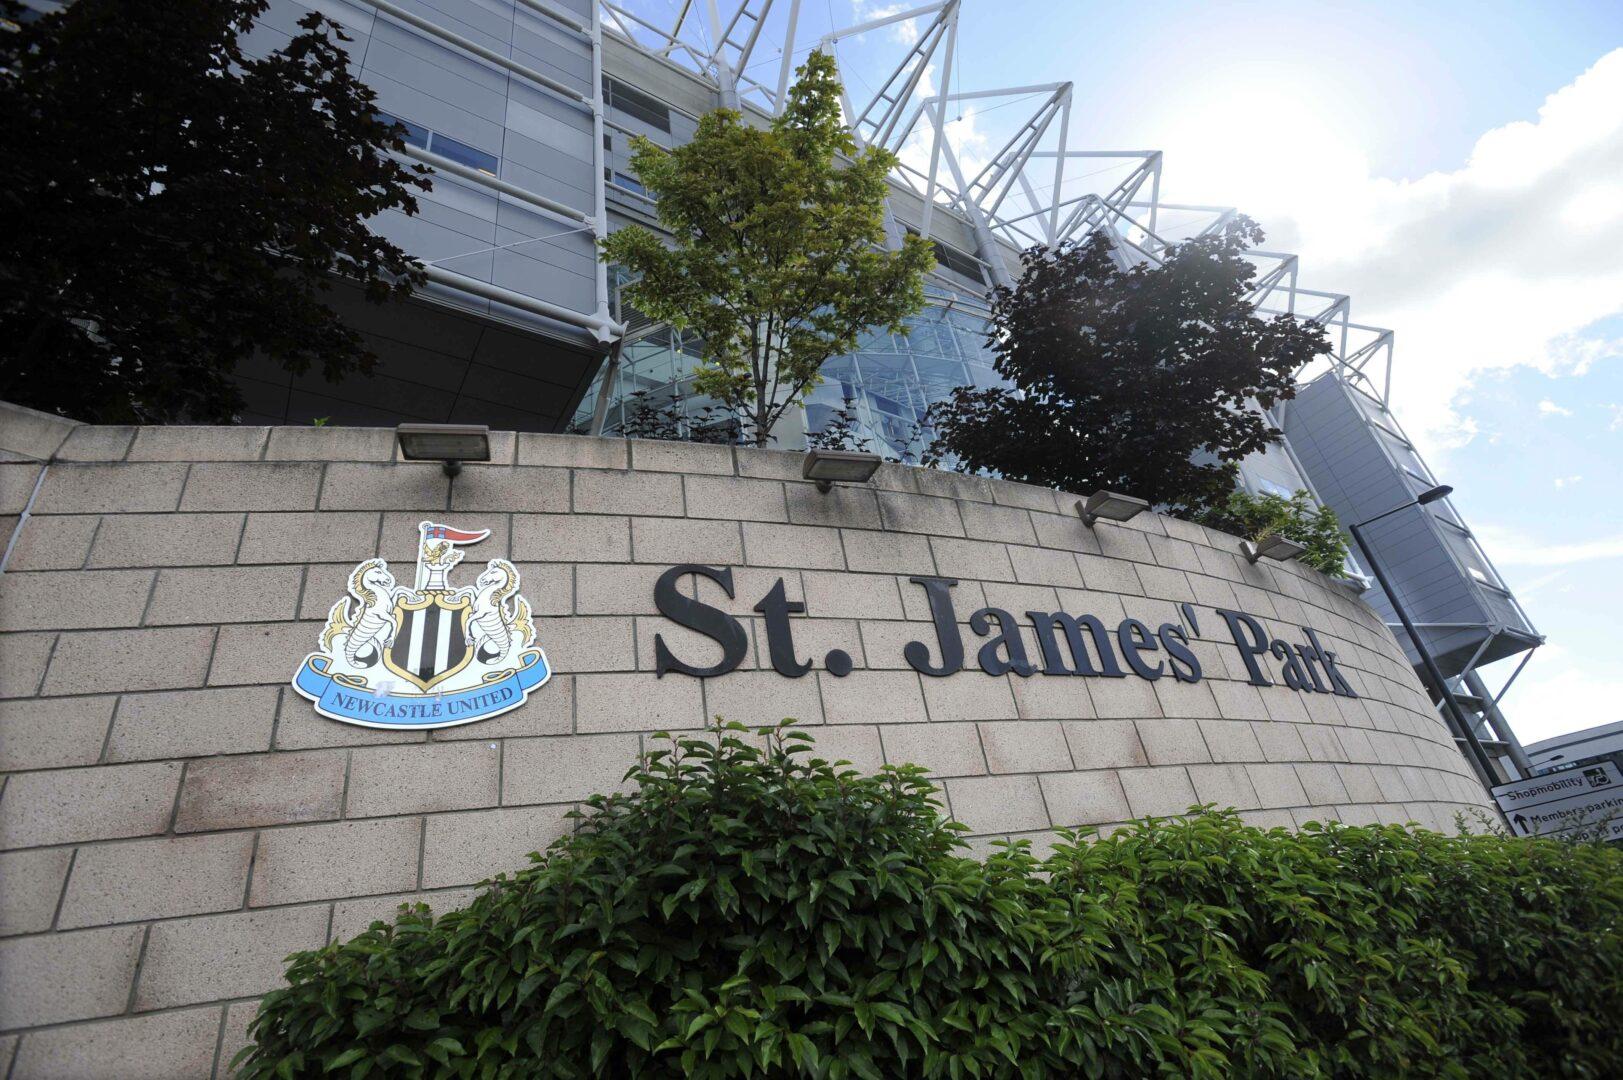 St. James Park Newcastle United